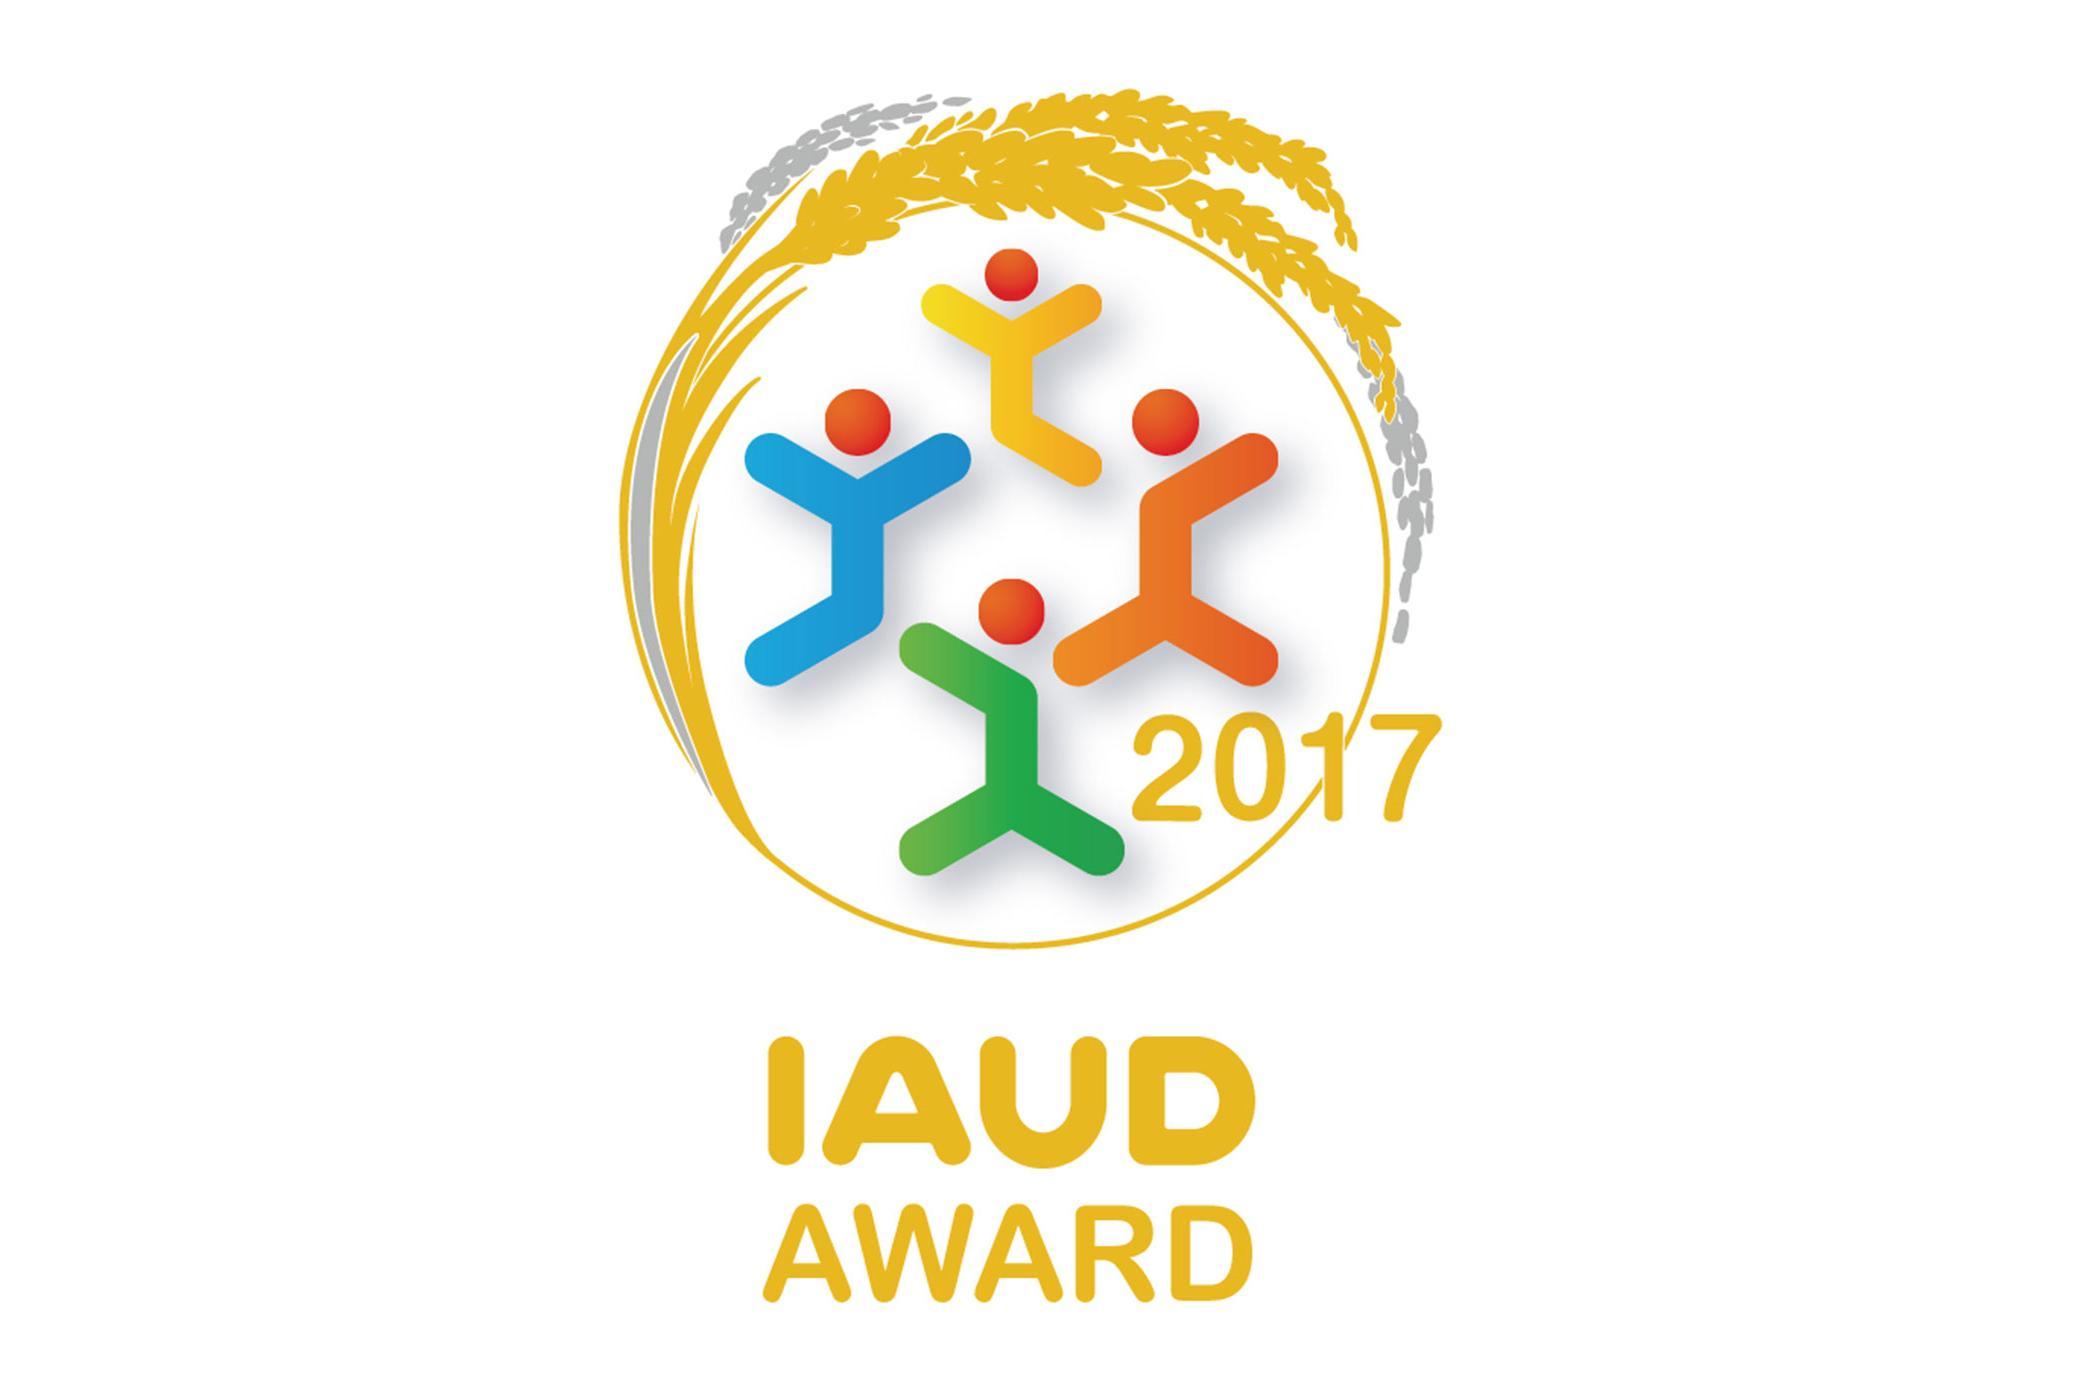 image: IAUD Award 2017 Grand Award logo